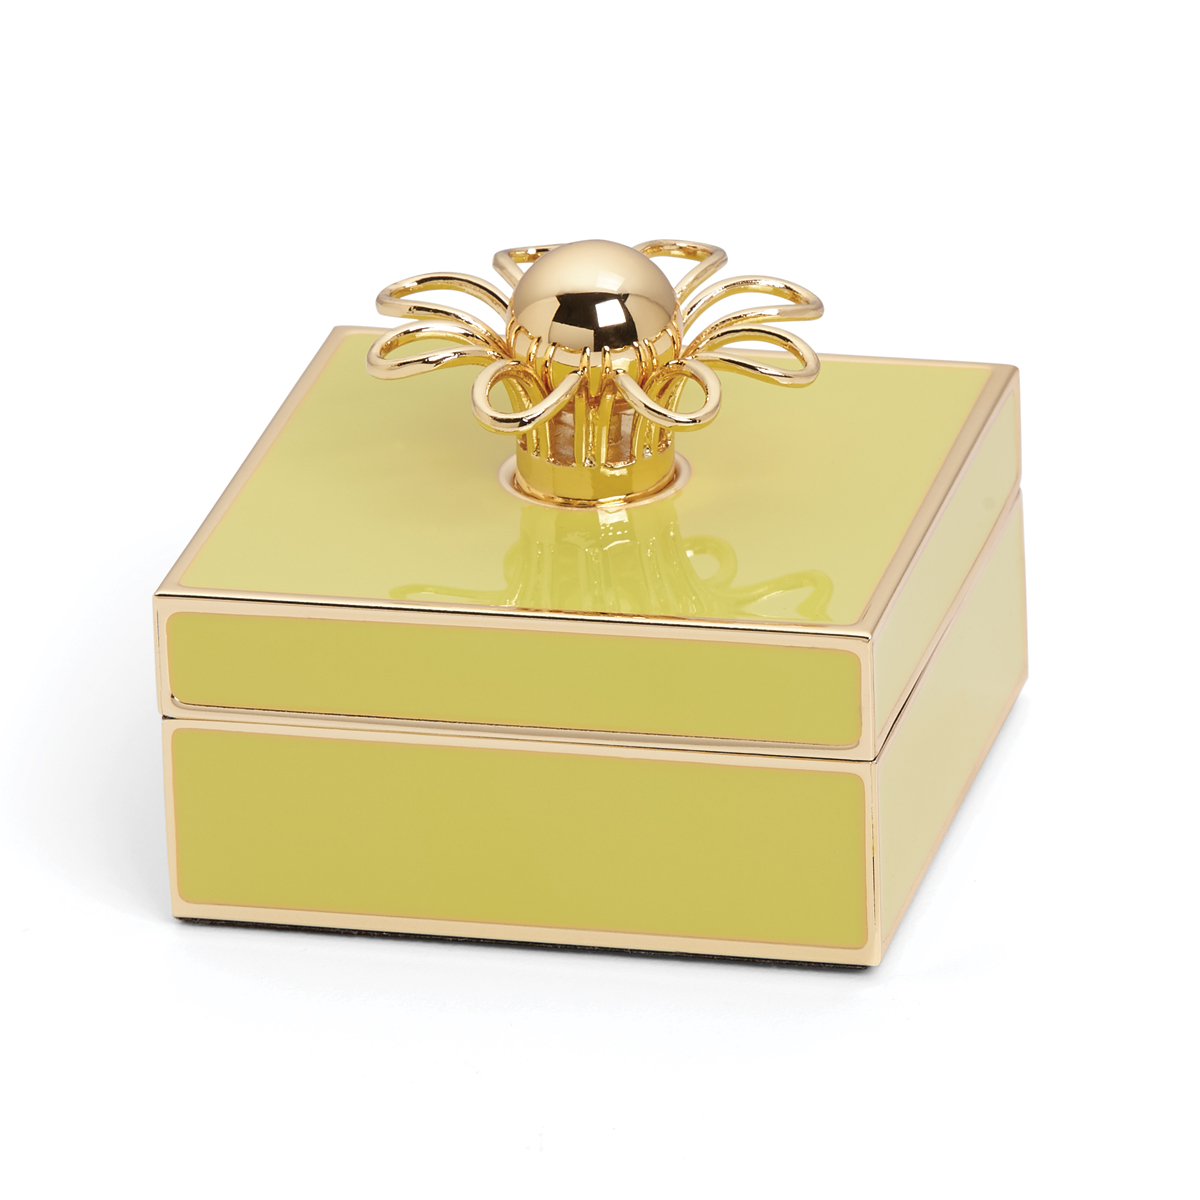 Kate Spade New York, Lenox Keaton Street Gold Yellow Box